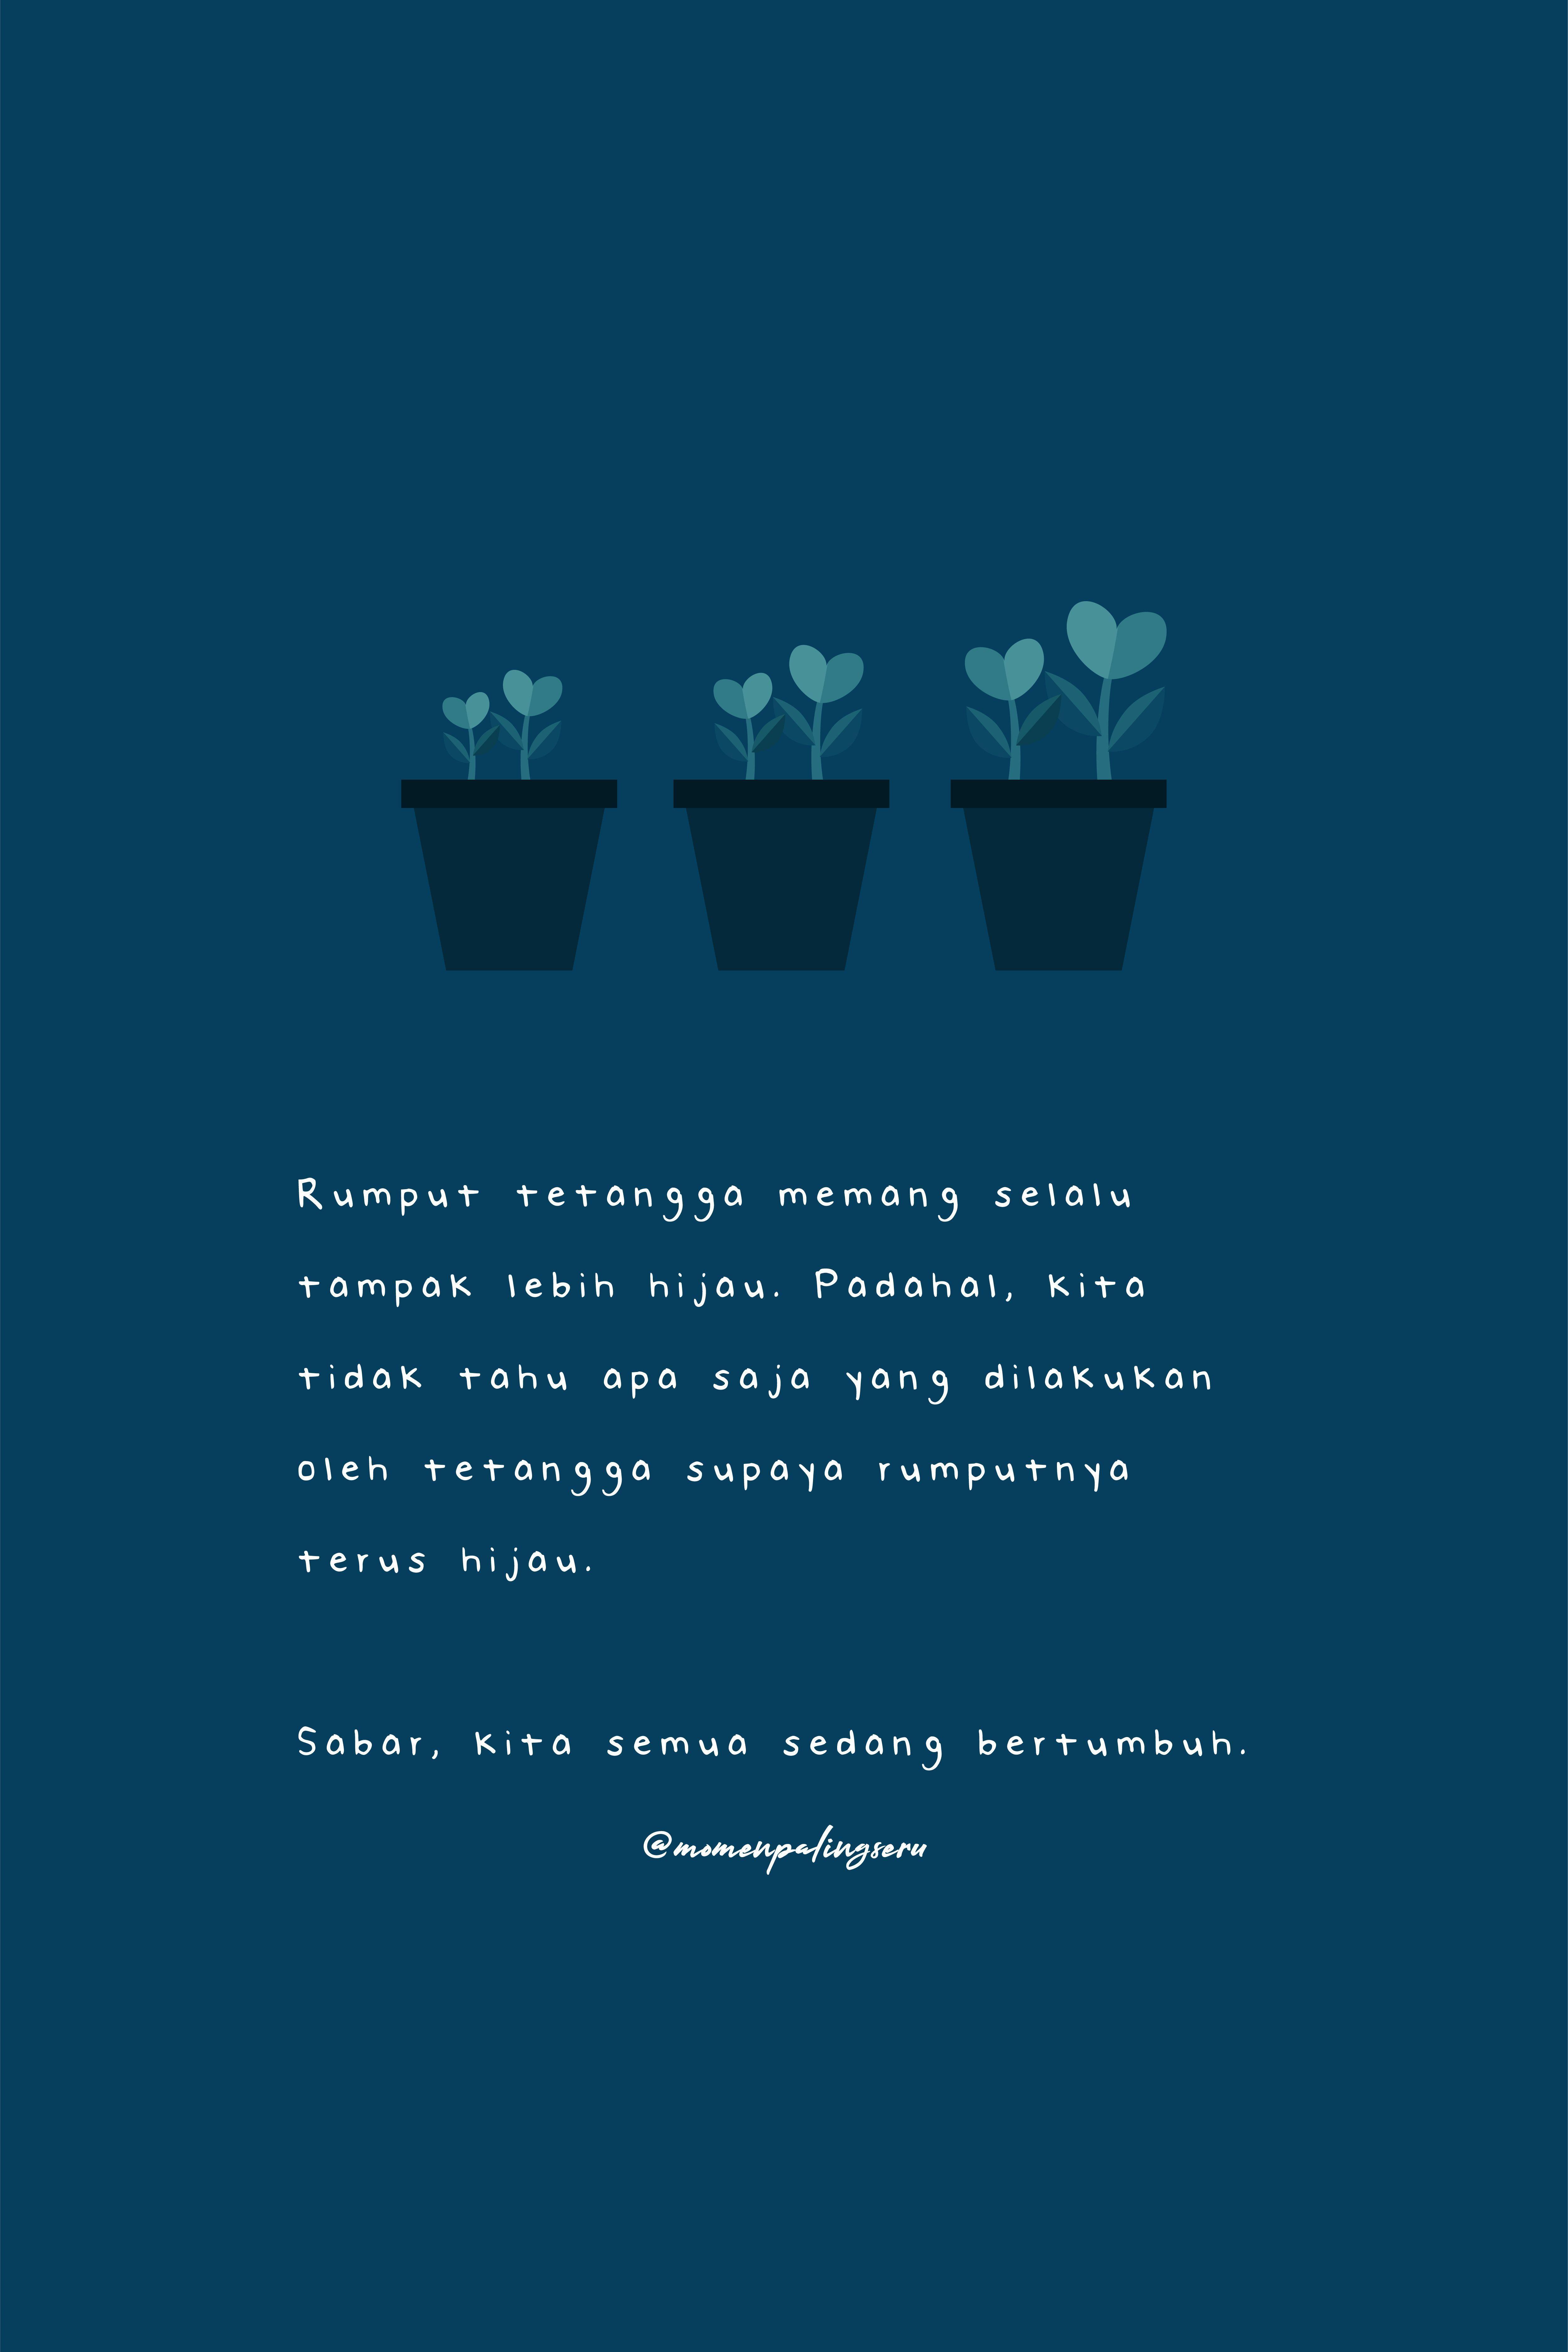 Quotes Semangat Motivation Quotes Semangat Motivasi Belajar Buku